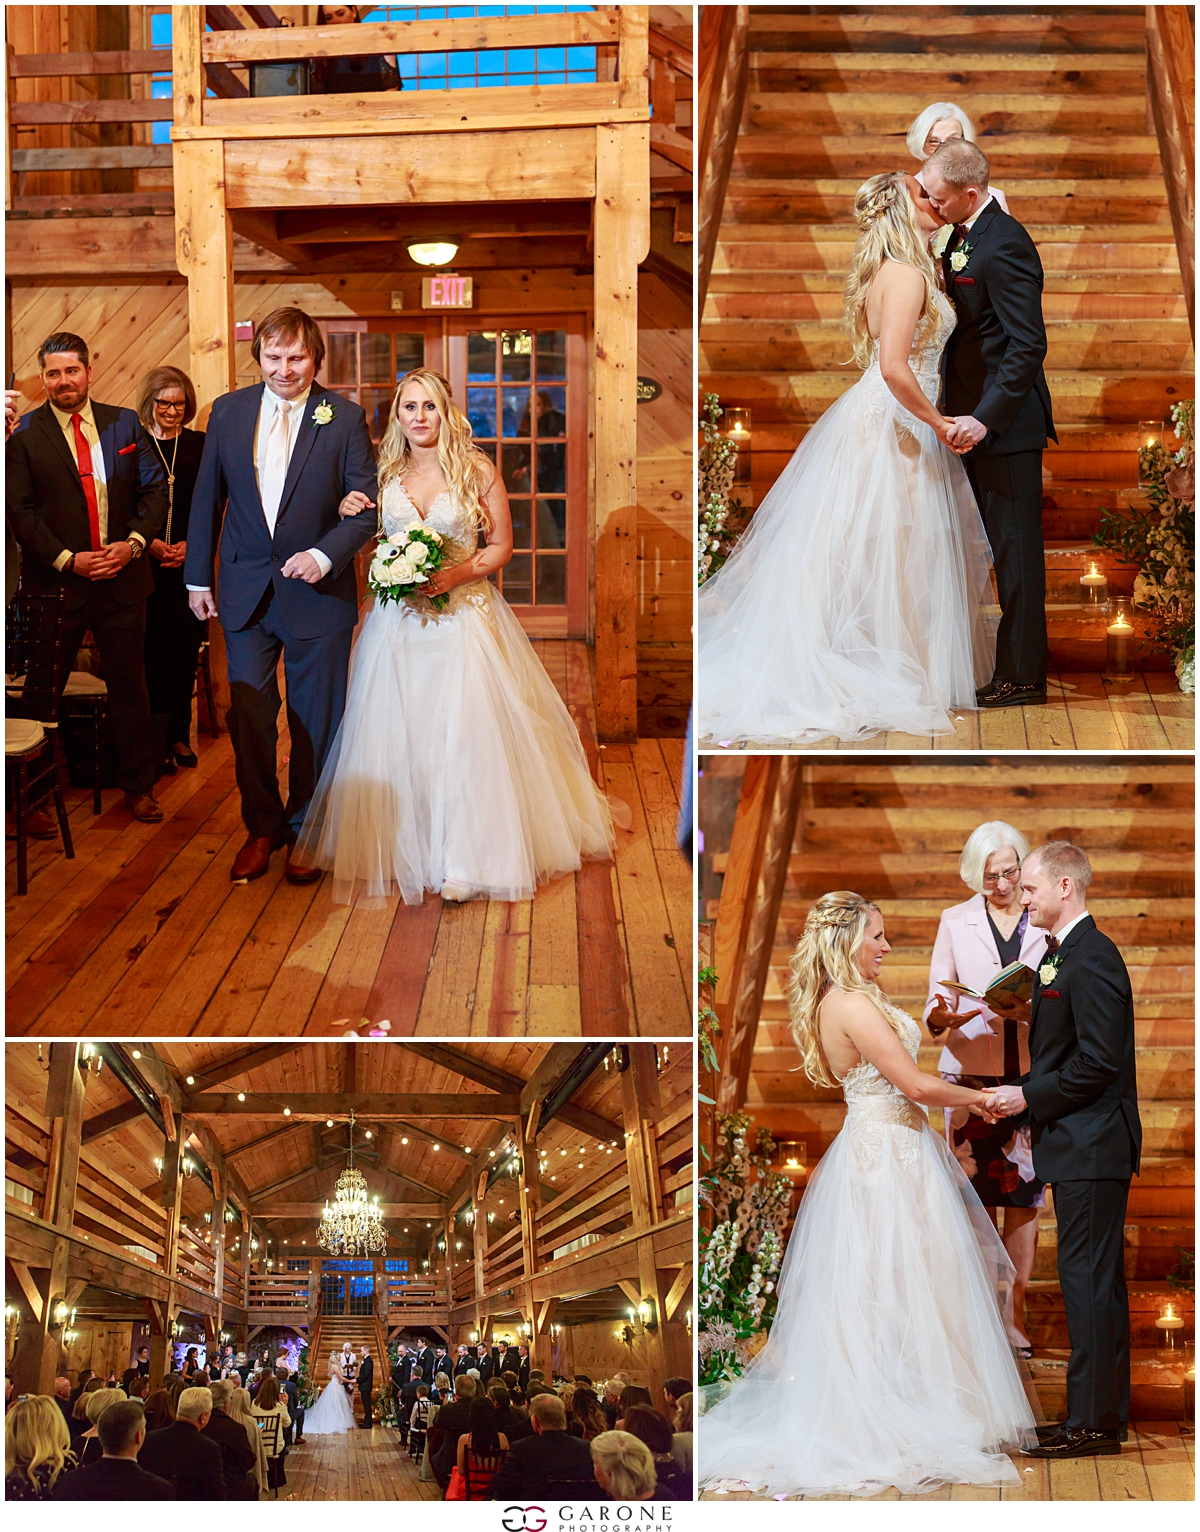 Brooke_Kenzie_Red_Lion_Inn_Cohasset_Ma_Boston_Wedding_Photographer_0081.jpg